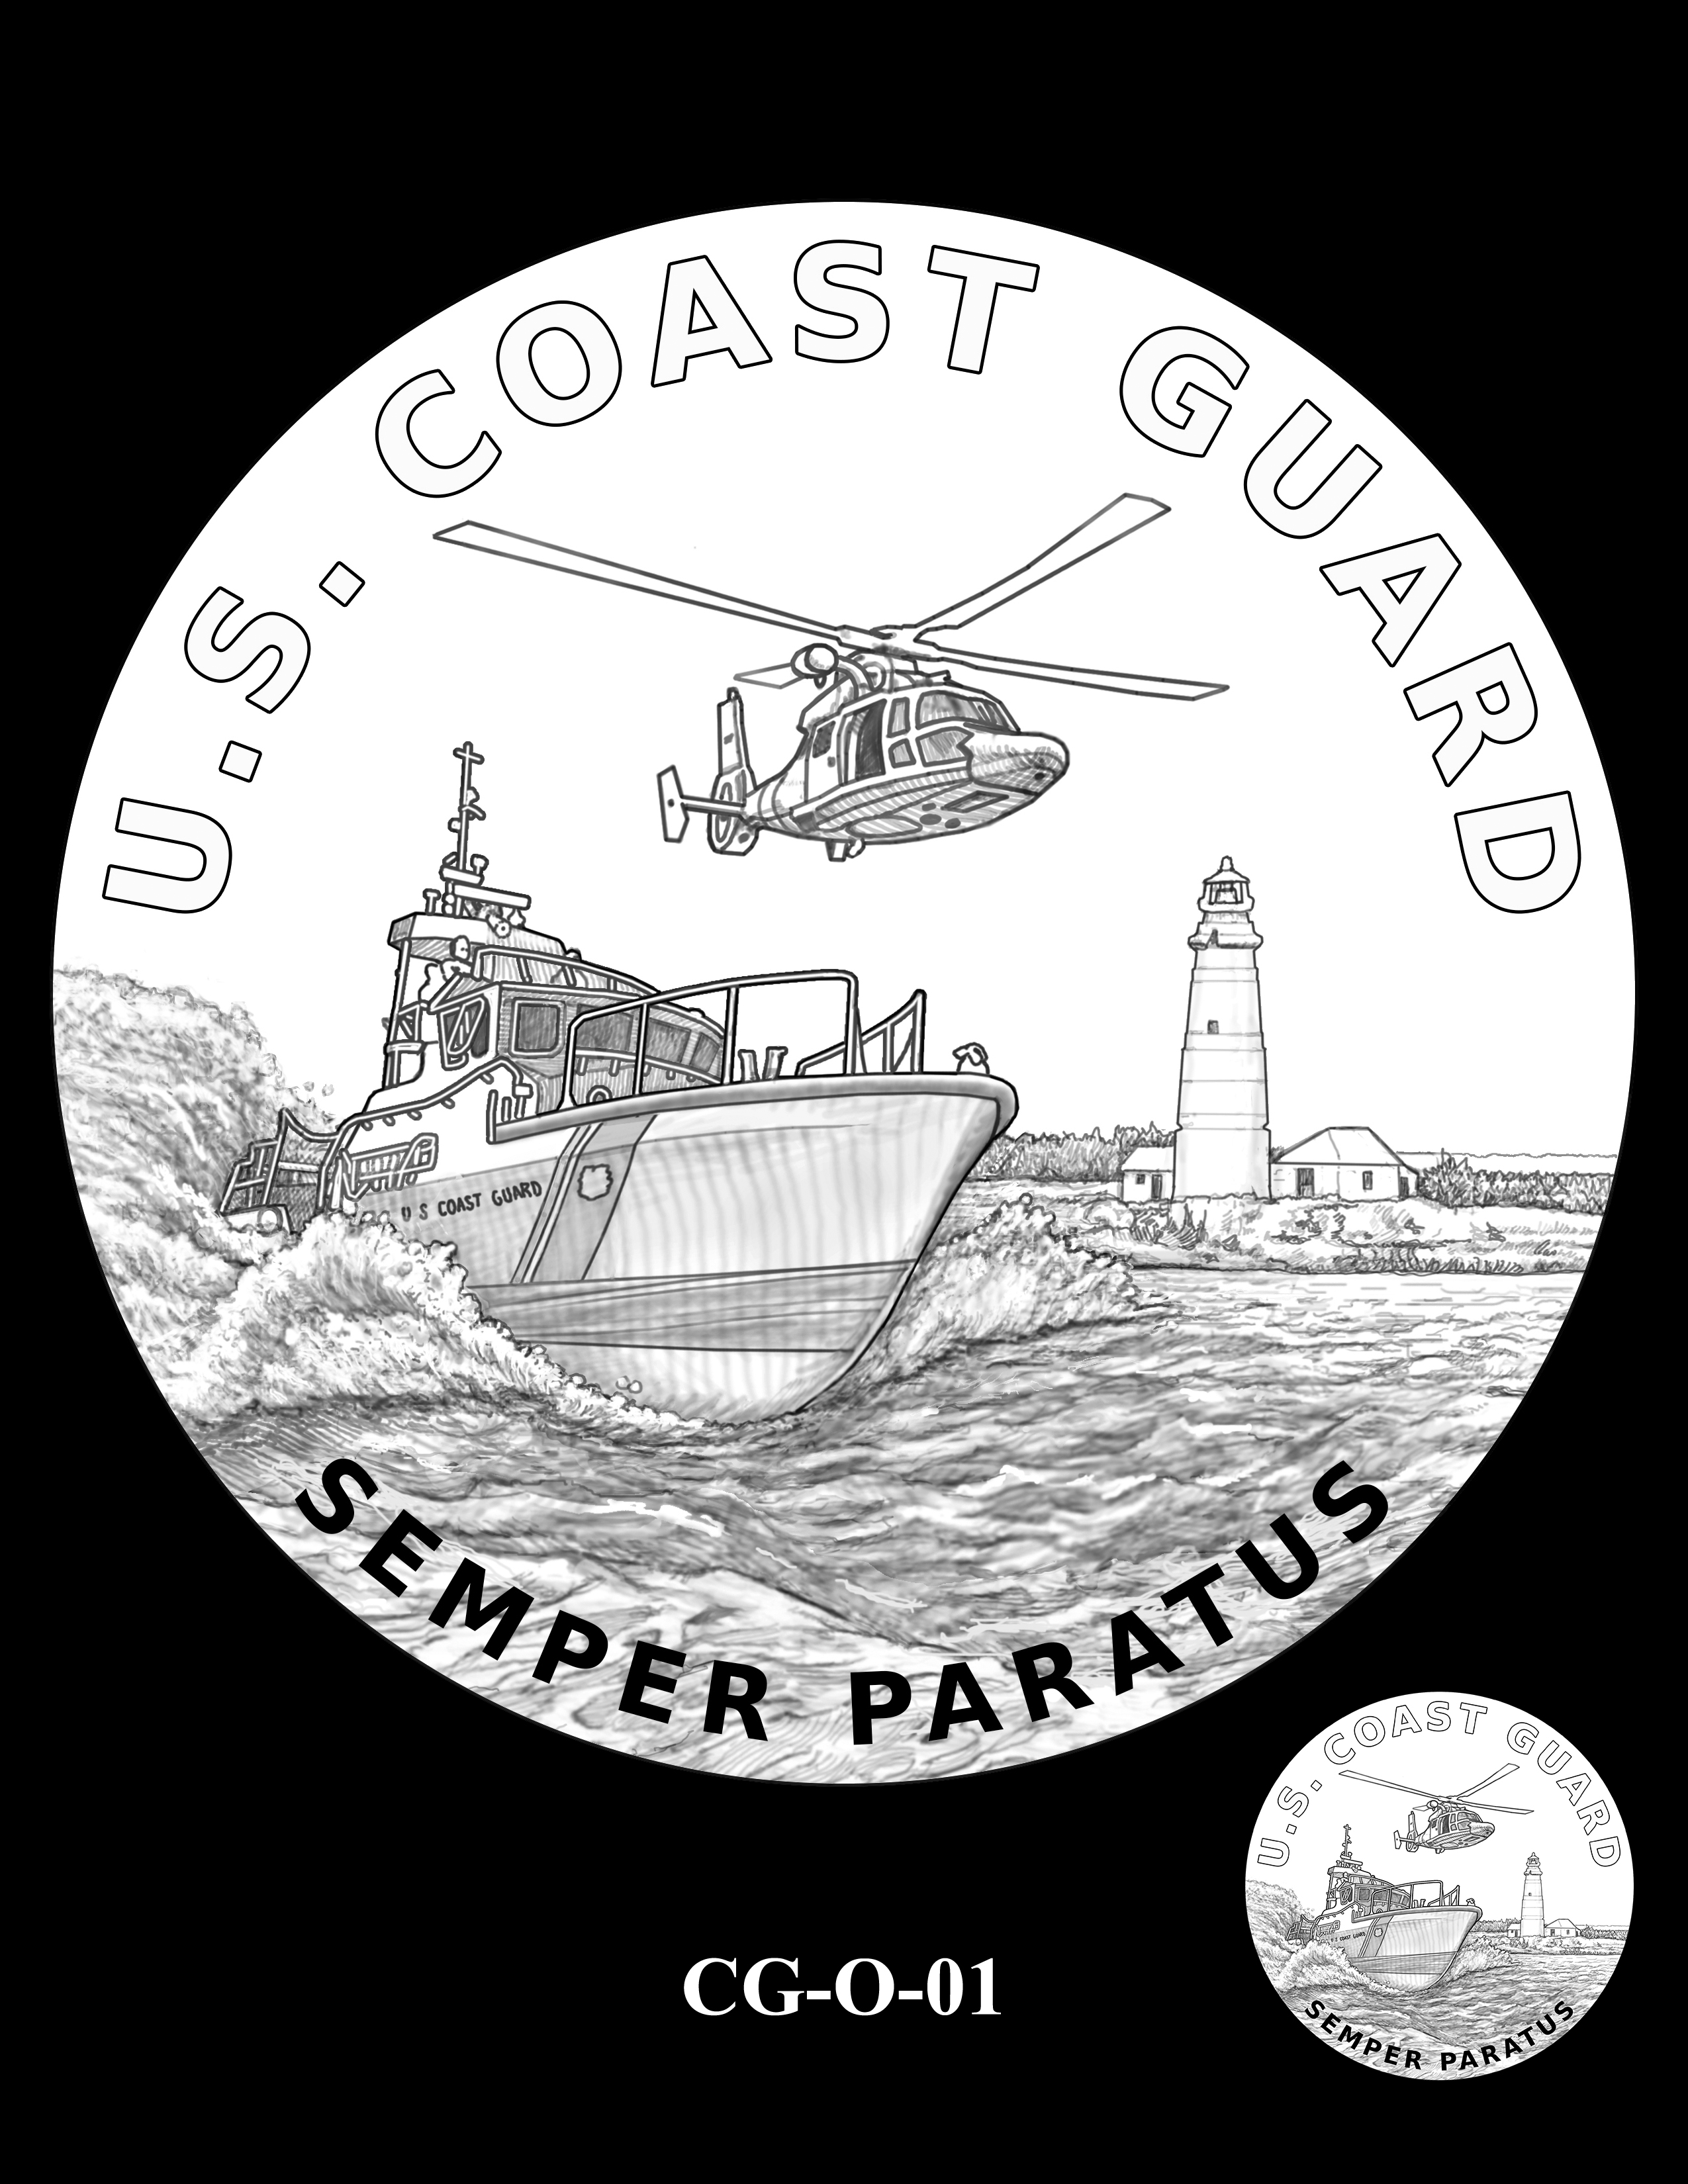 CG-O-01 -- Armed Forces Medal - Coast Guard